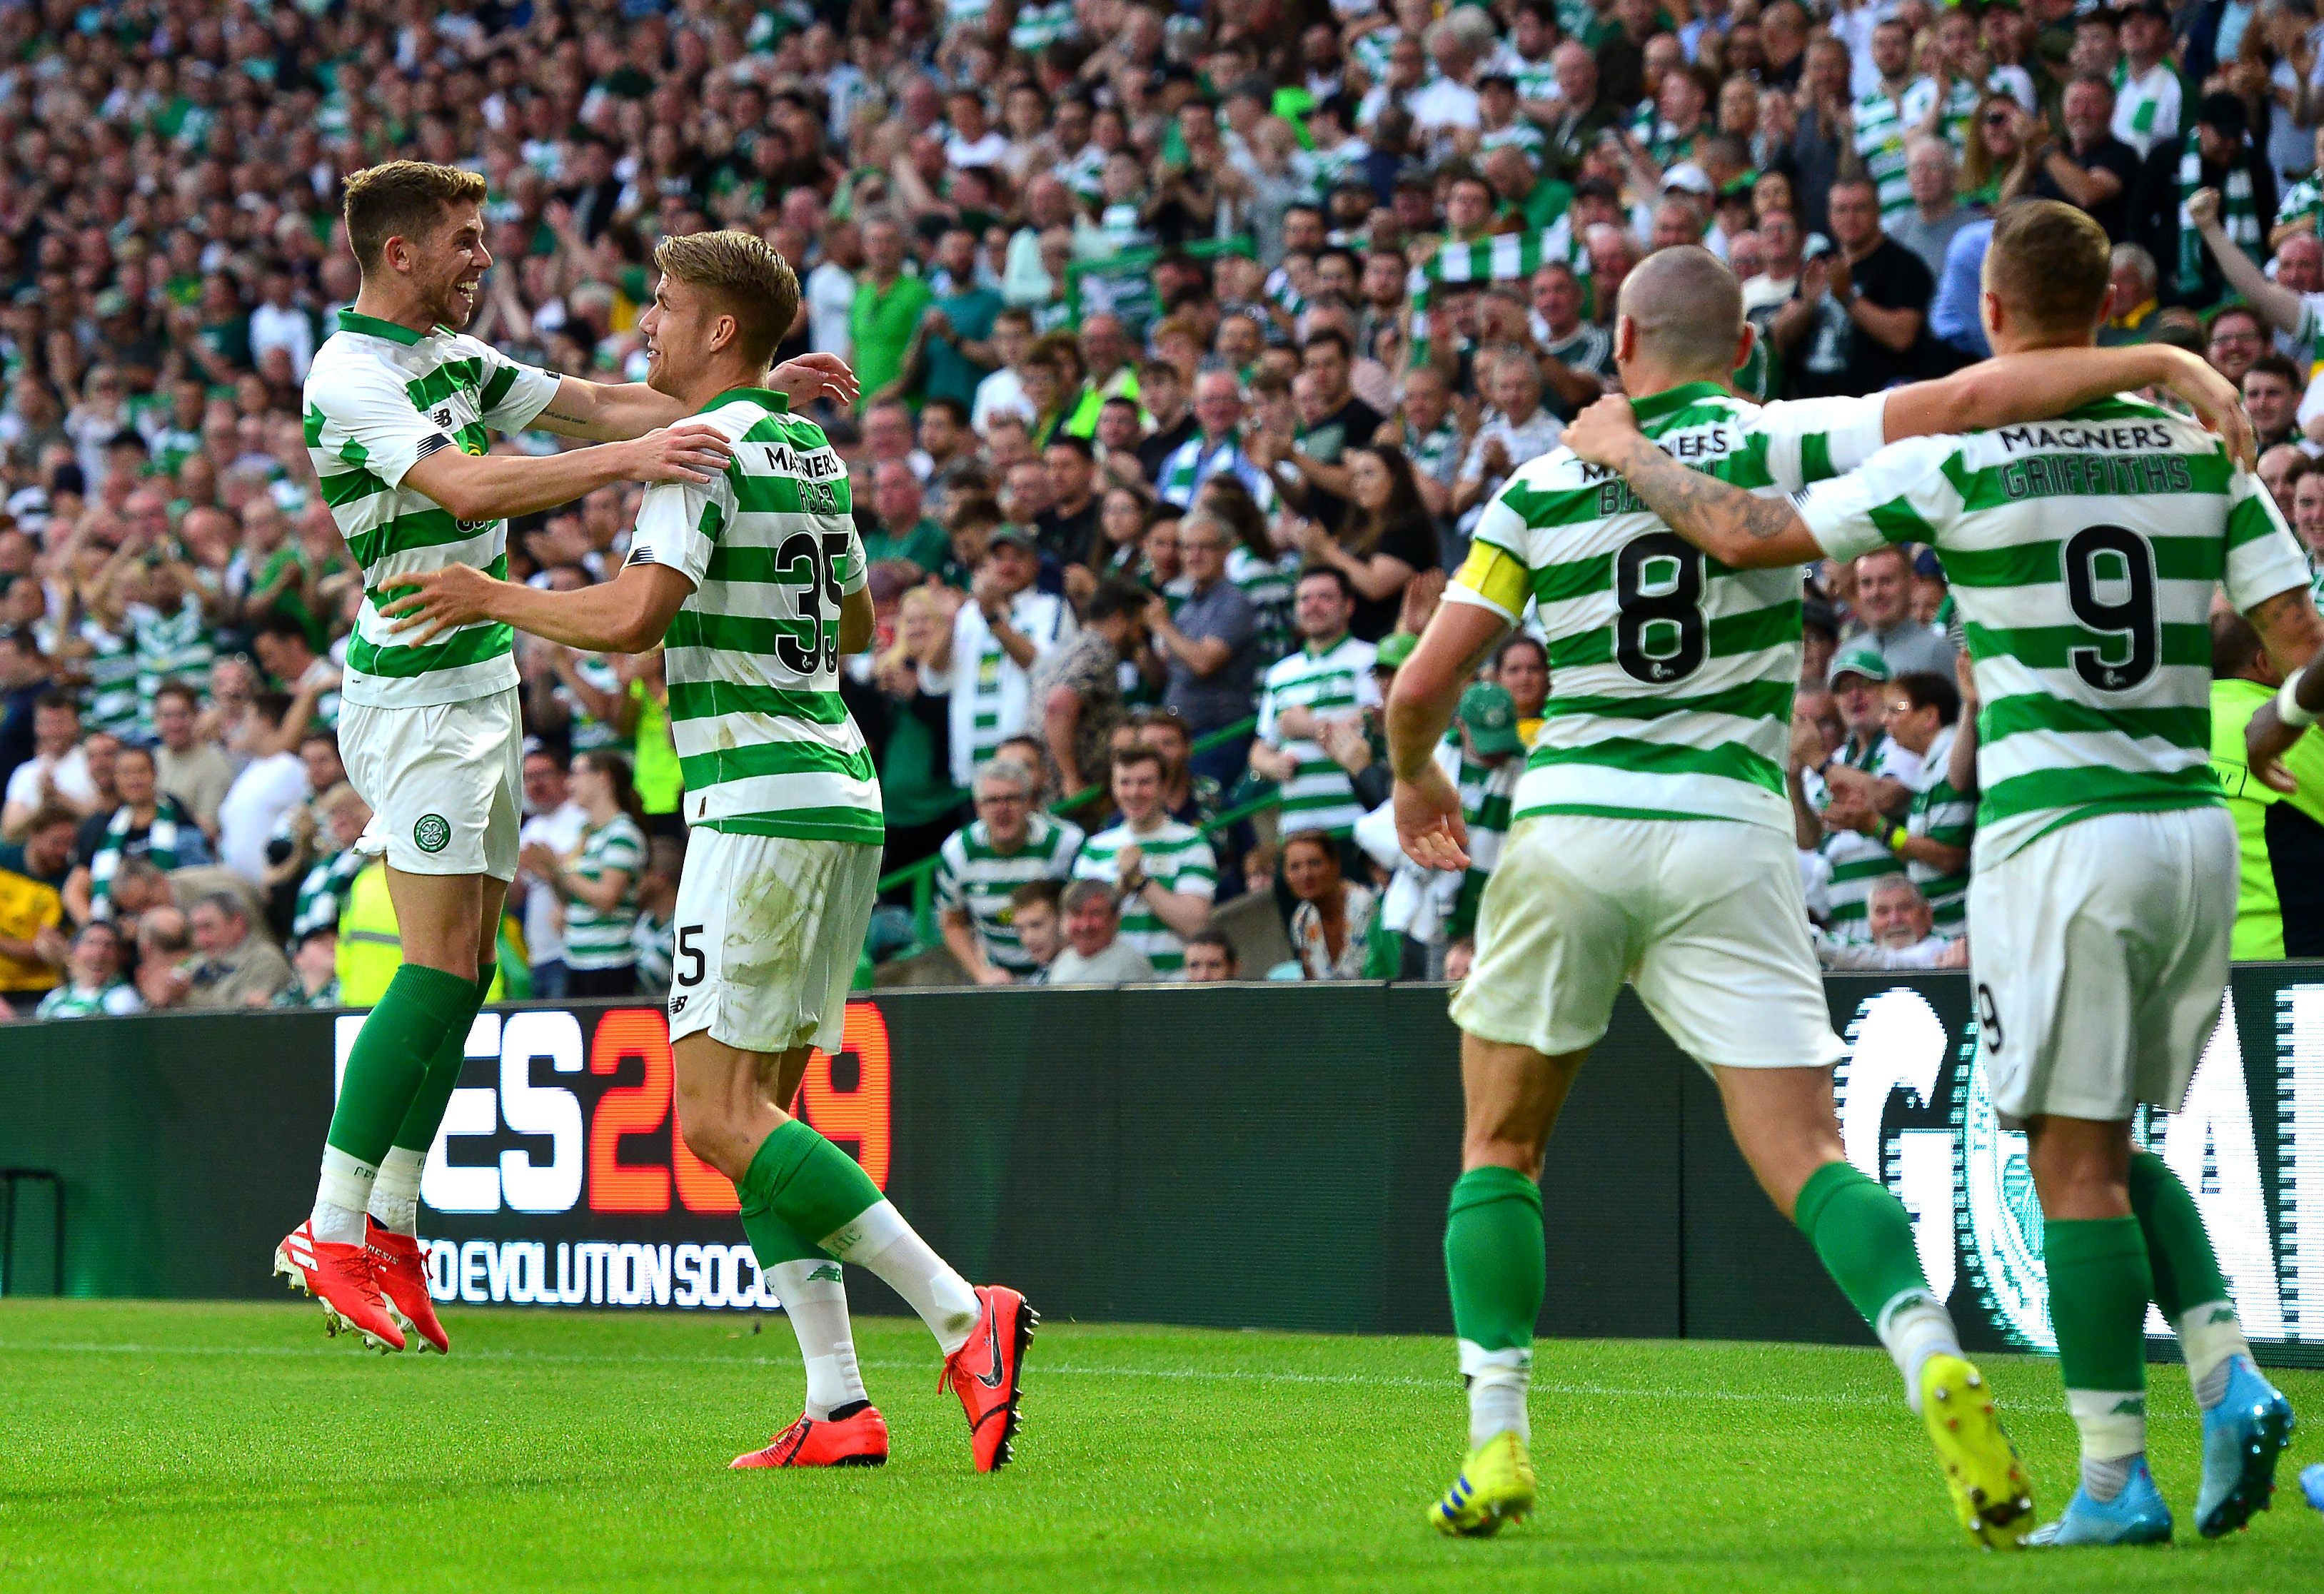 Celtic Nomme Kalju UEFA Champions League 07/24/19